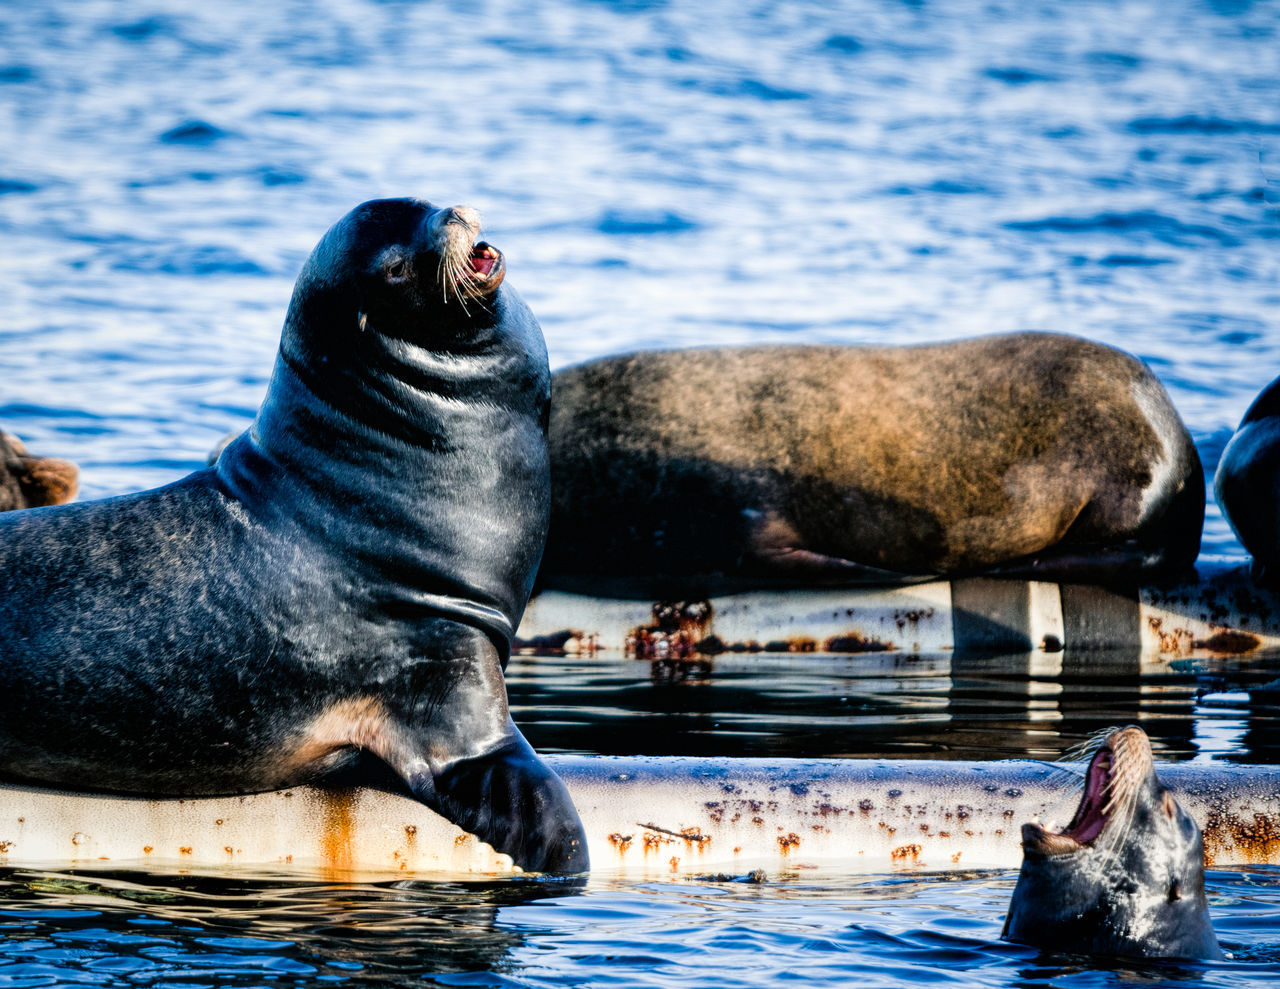 Animal Themes Animal Wildlife Animals In The Wild Aquatic Mammal Day Mammal Nature No People One Animal Outdoors Sea Sea Life Sea Lion Sealions Swimming Water